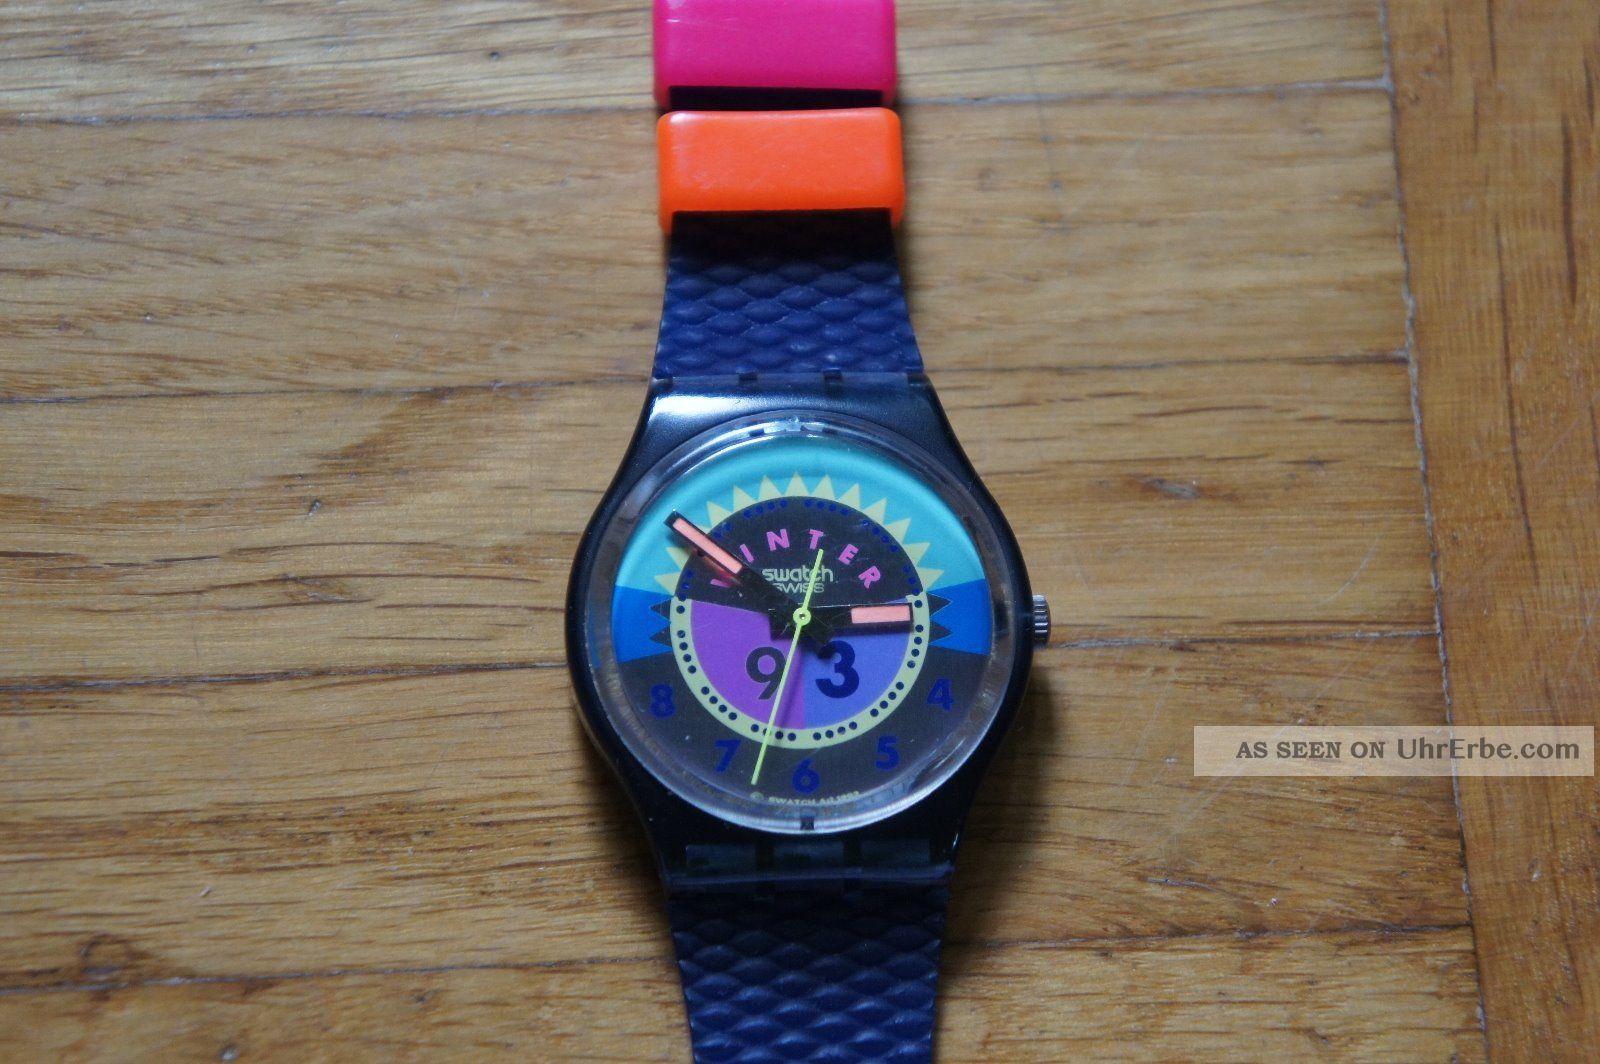 Swatch / Quarz / Winter 1993 / Armbanduhr / Uhr / S335 Armbanduhren Bild